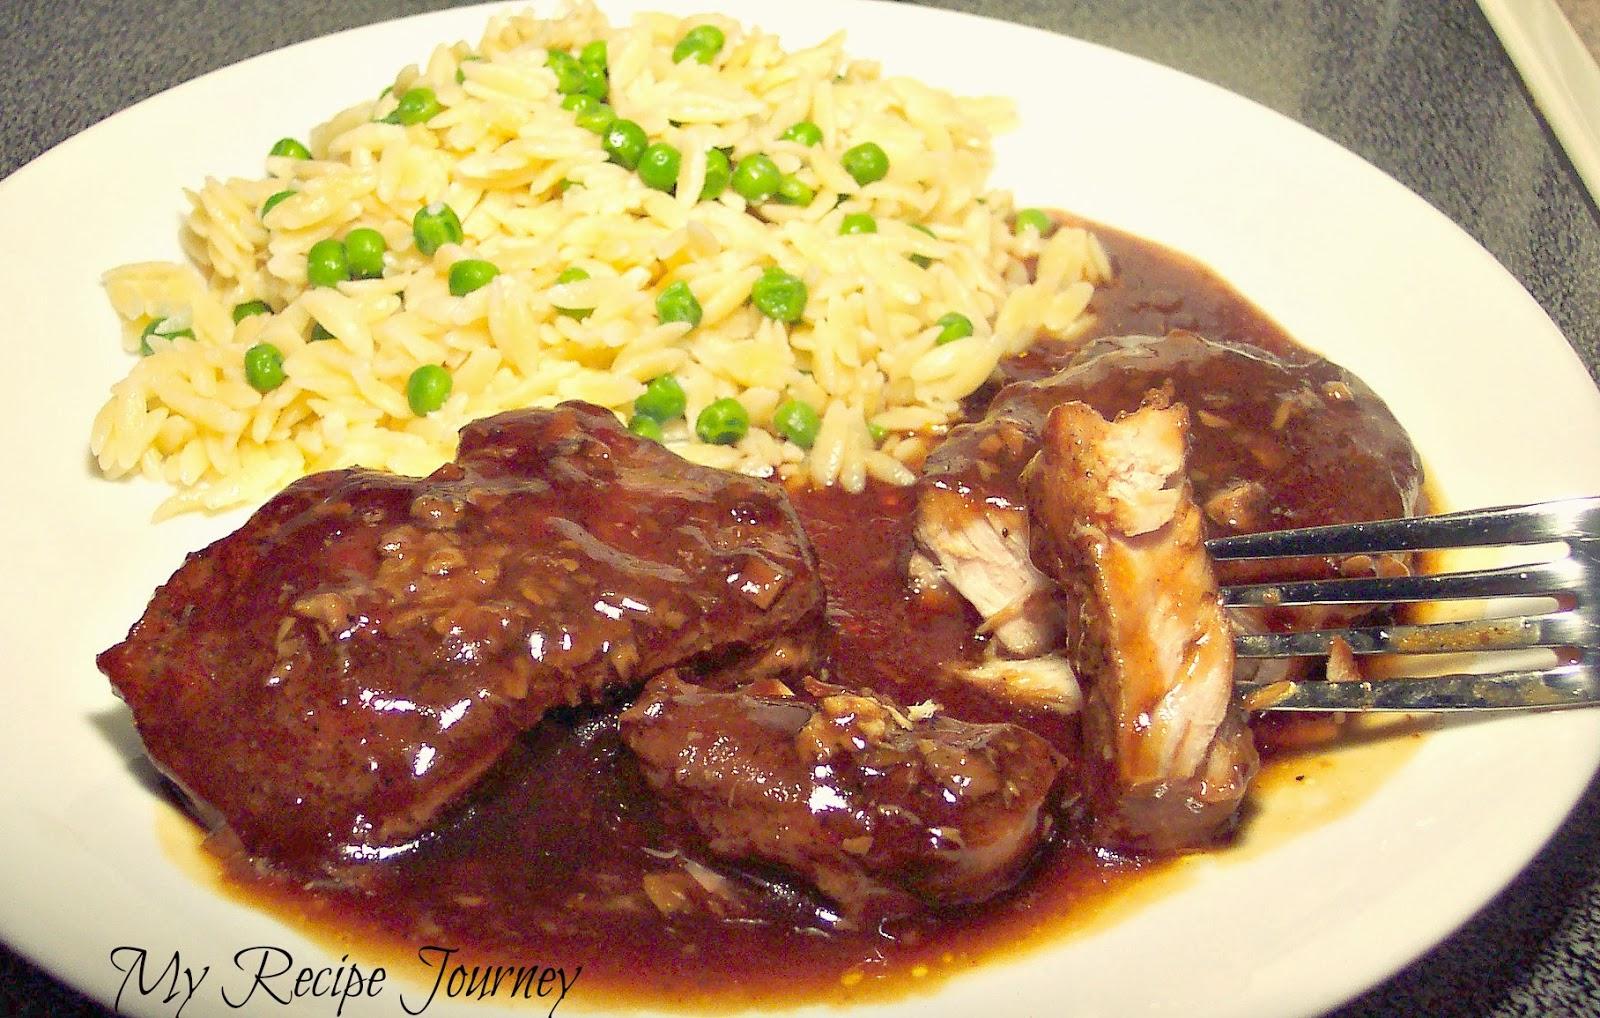 My Recipe Journey: San Francisco Pork Chops